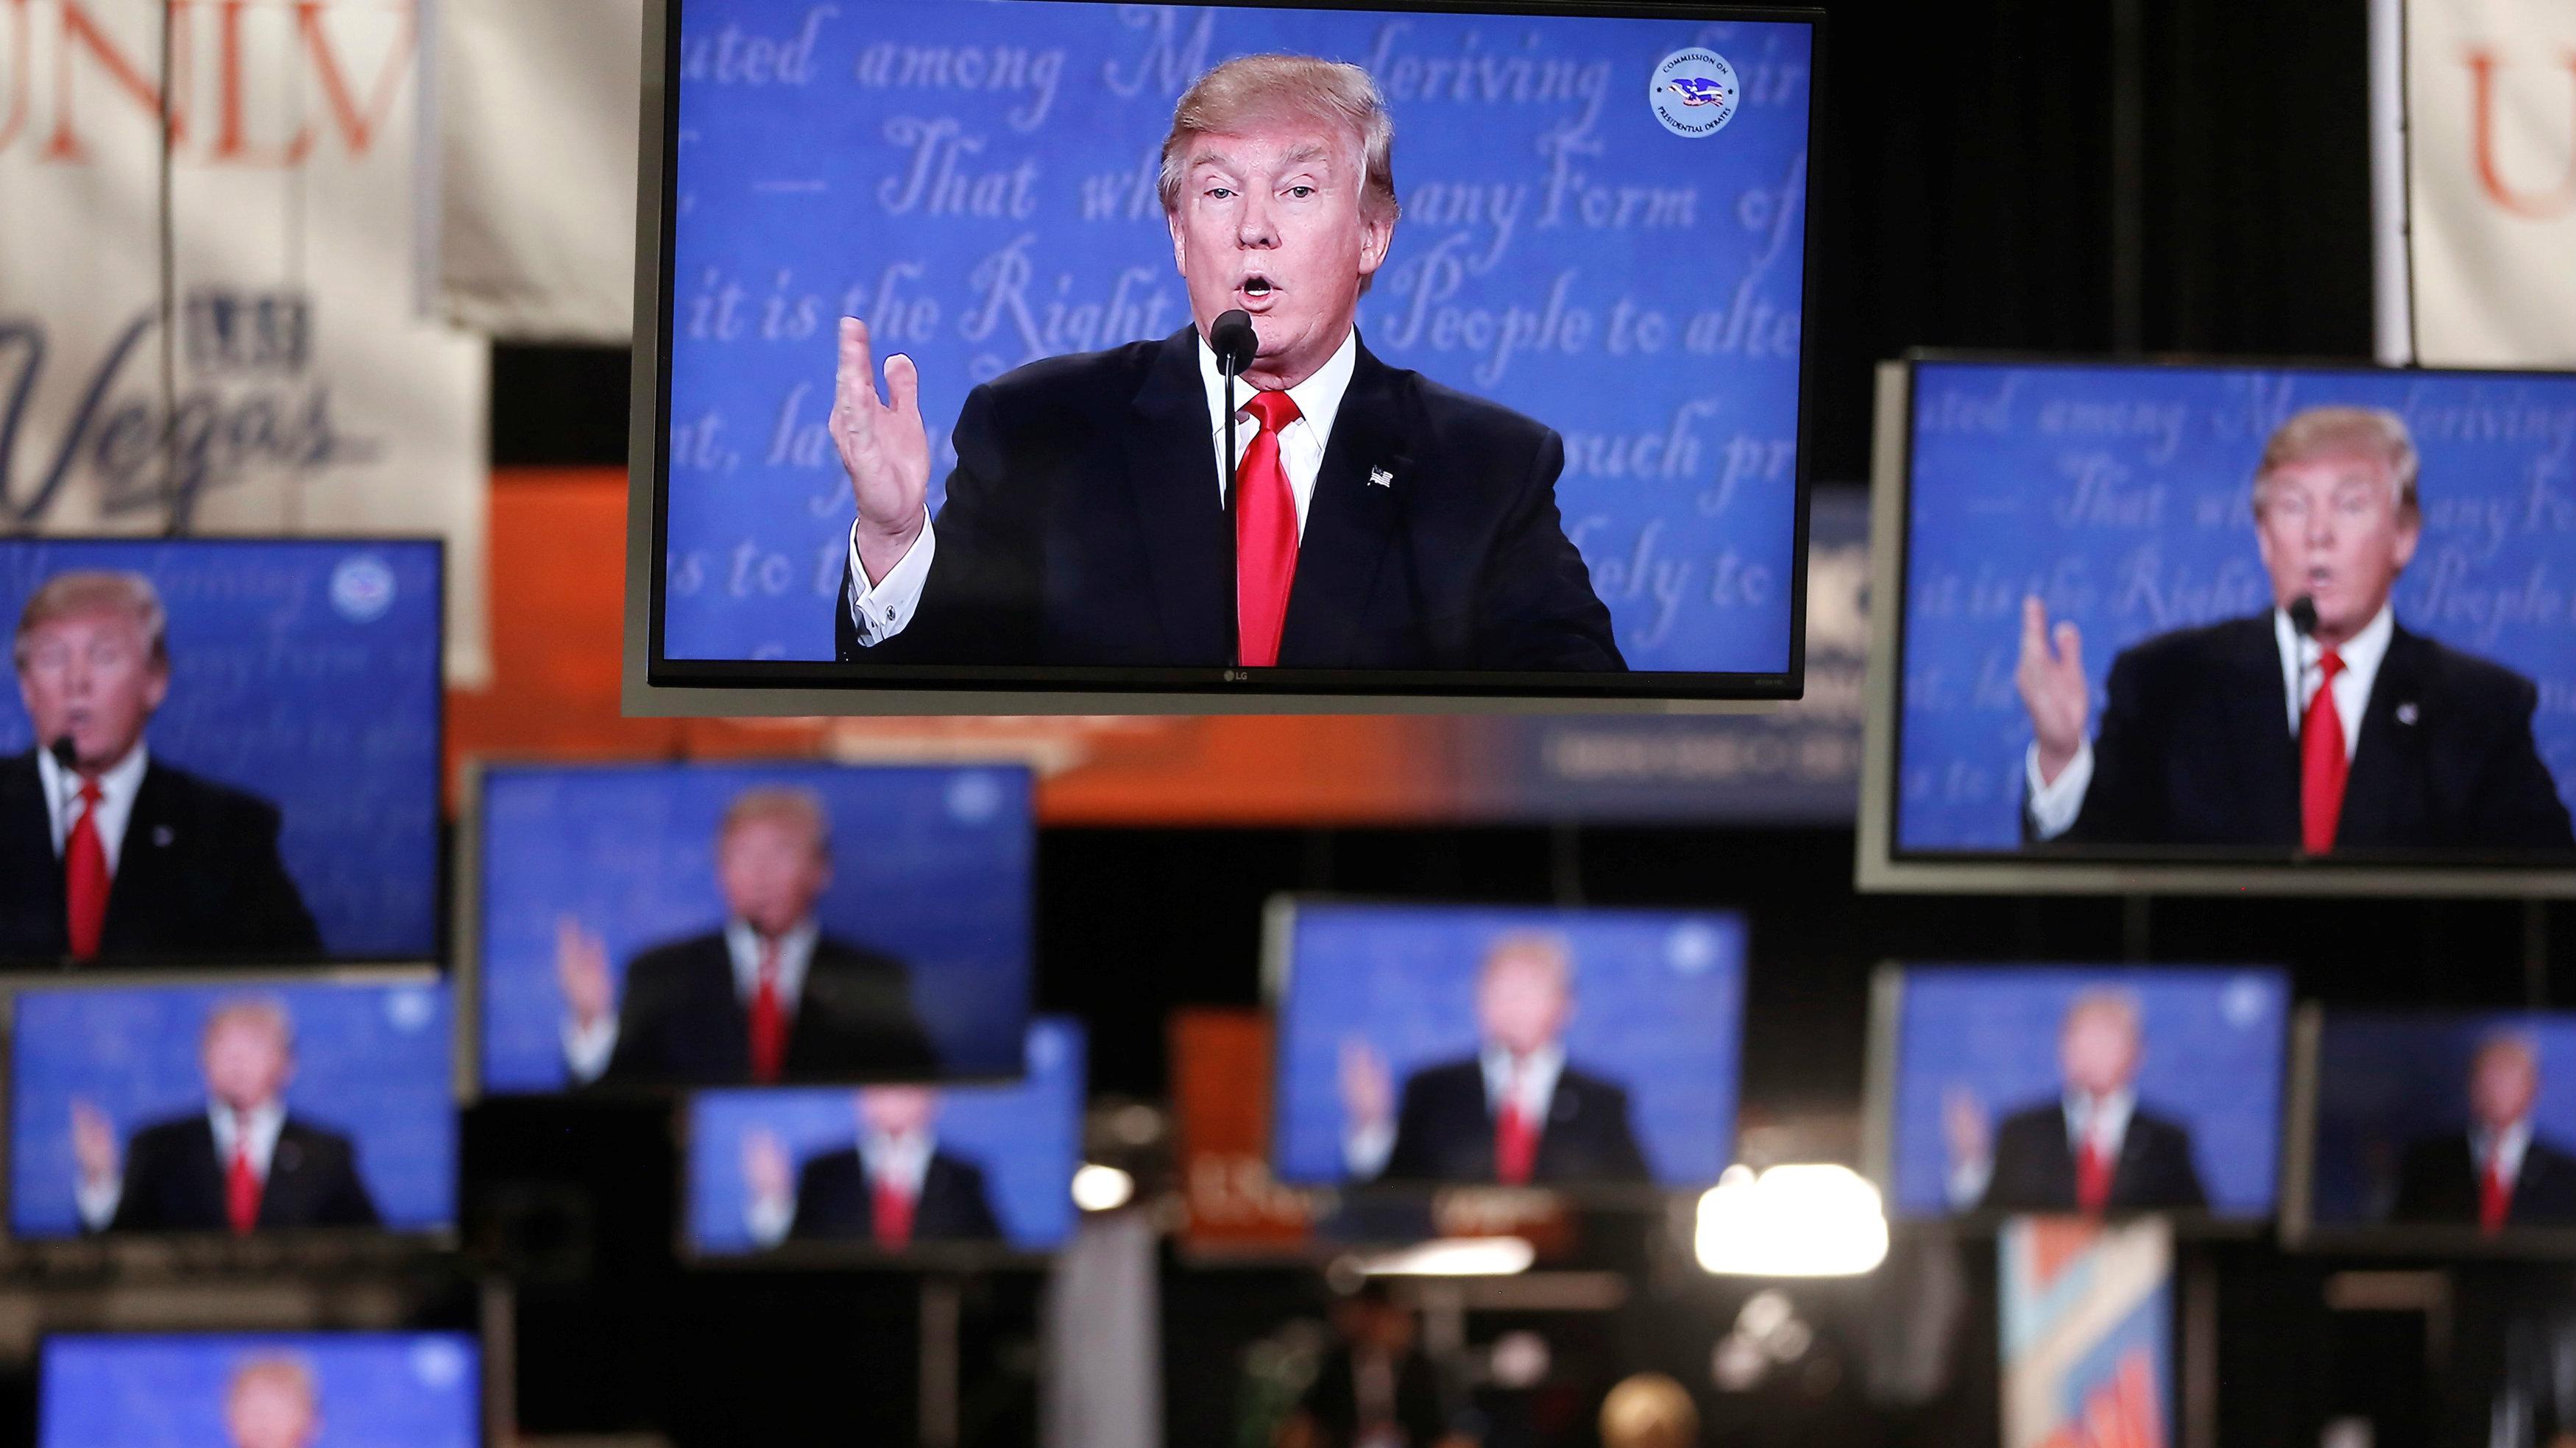 Donald Trump on TV.